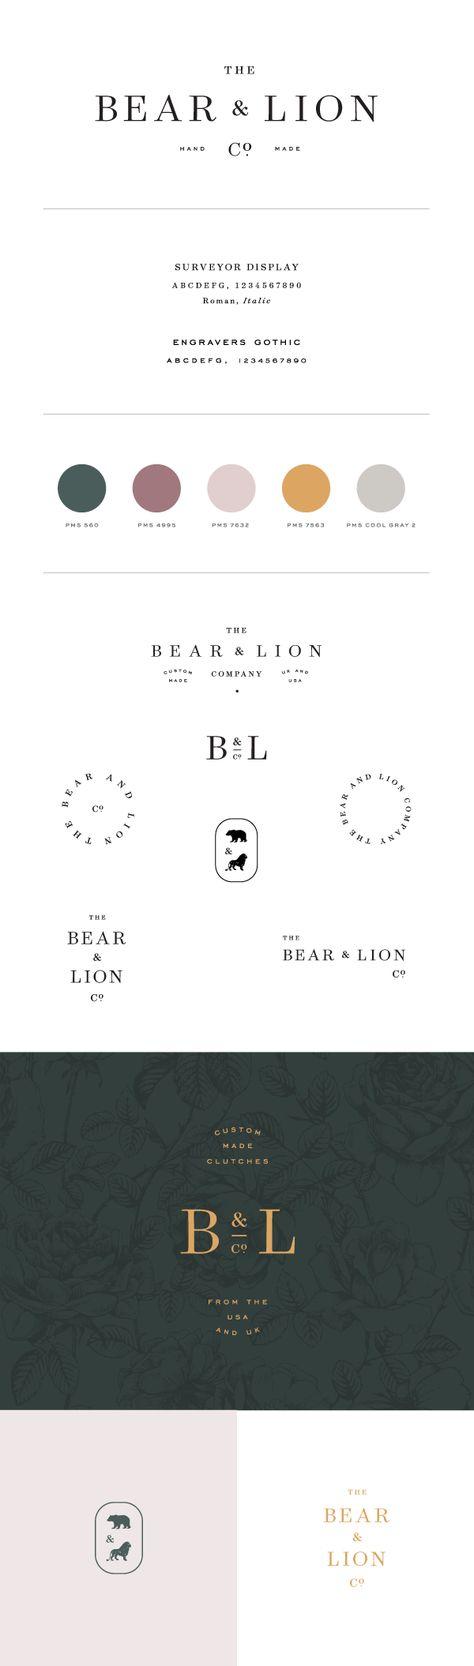 The Bear & Lion Co. branding by Saturday Studio